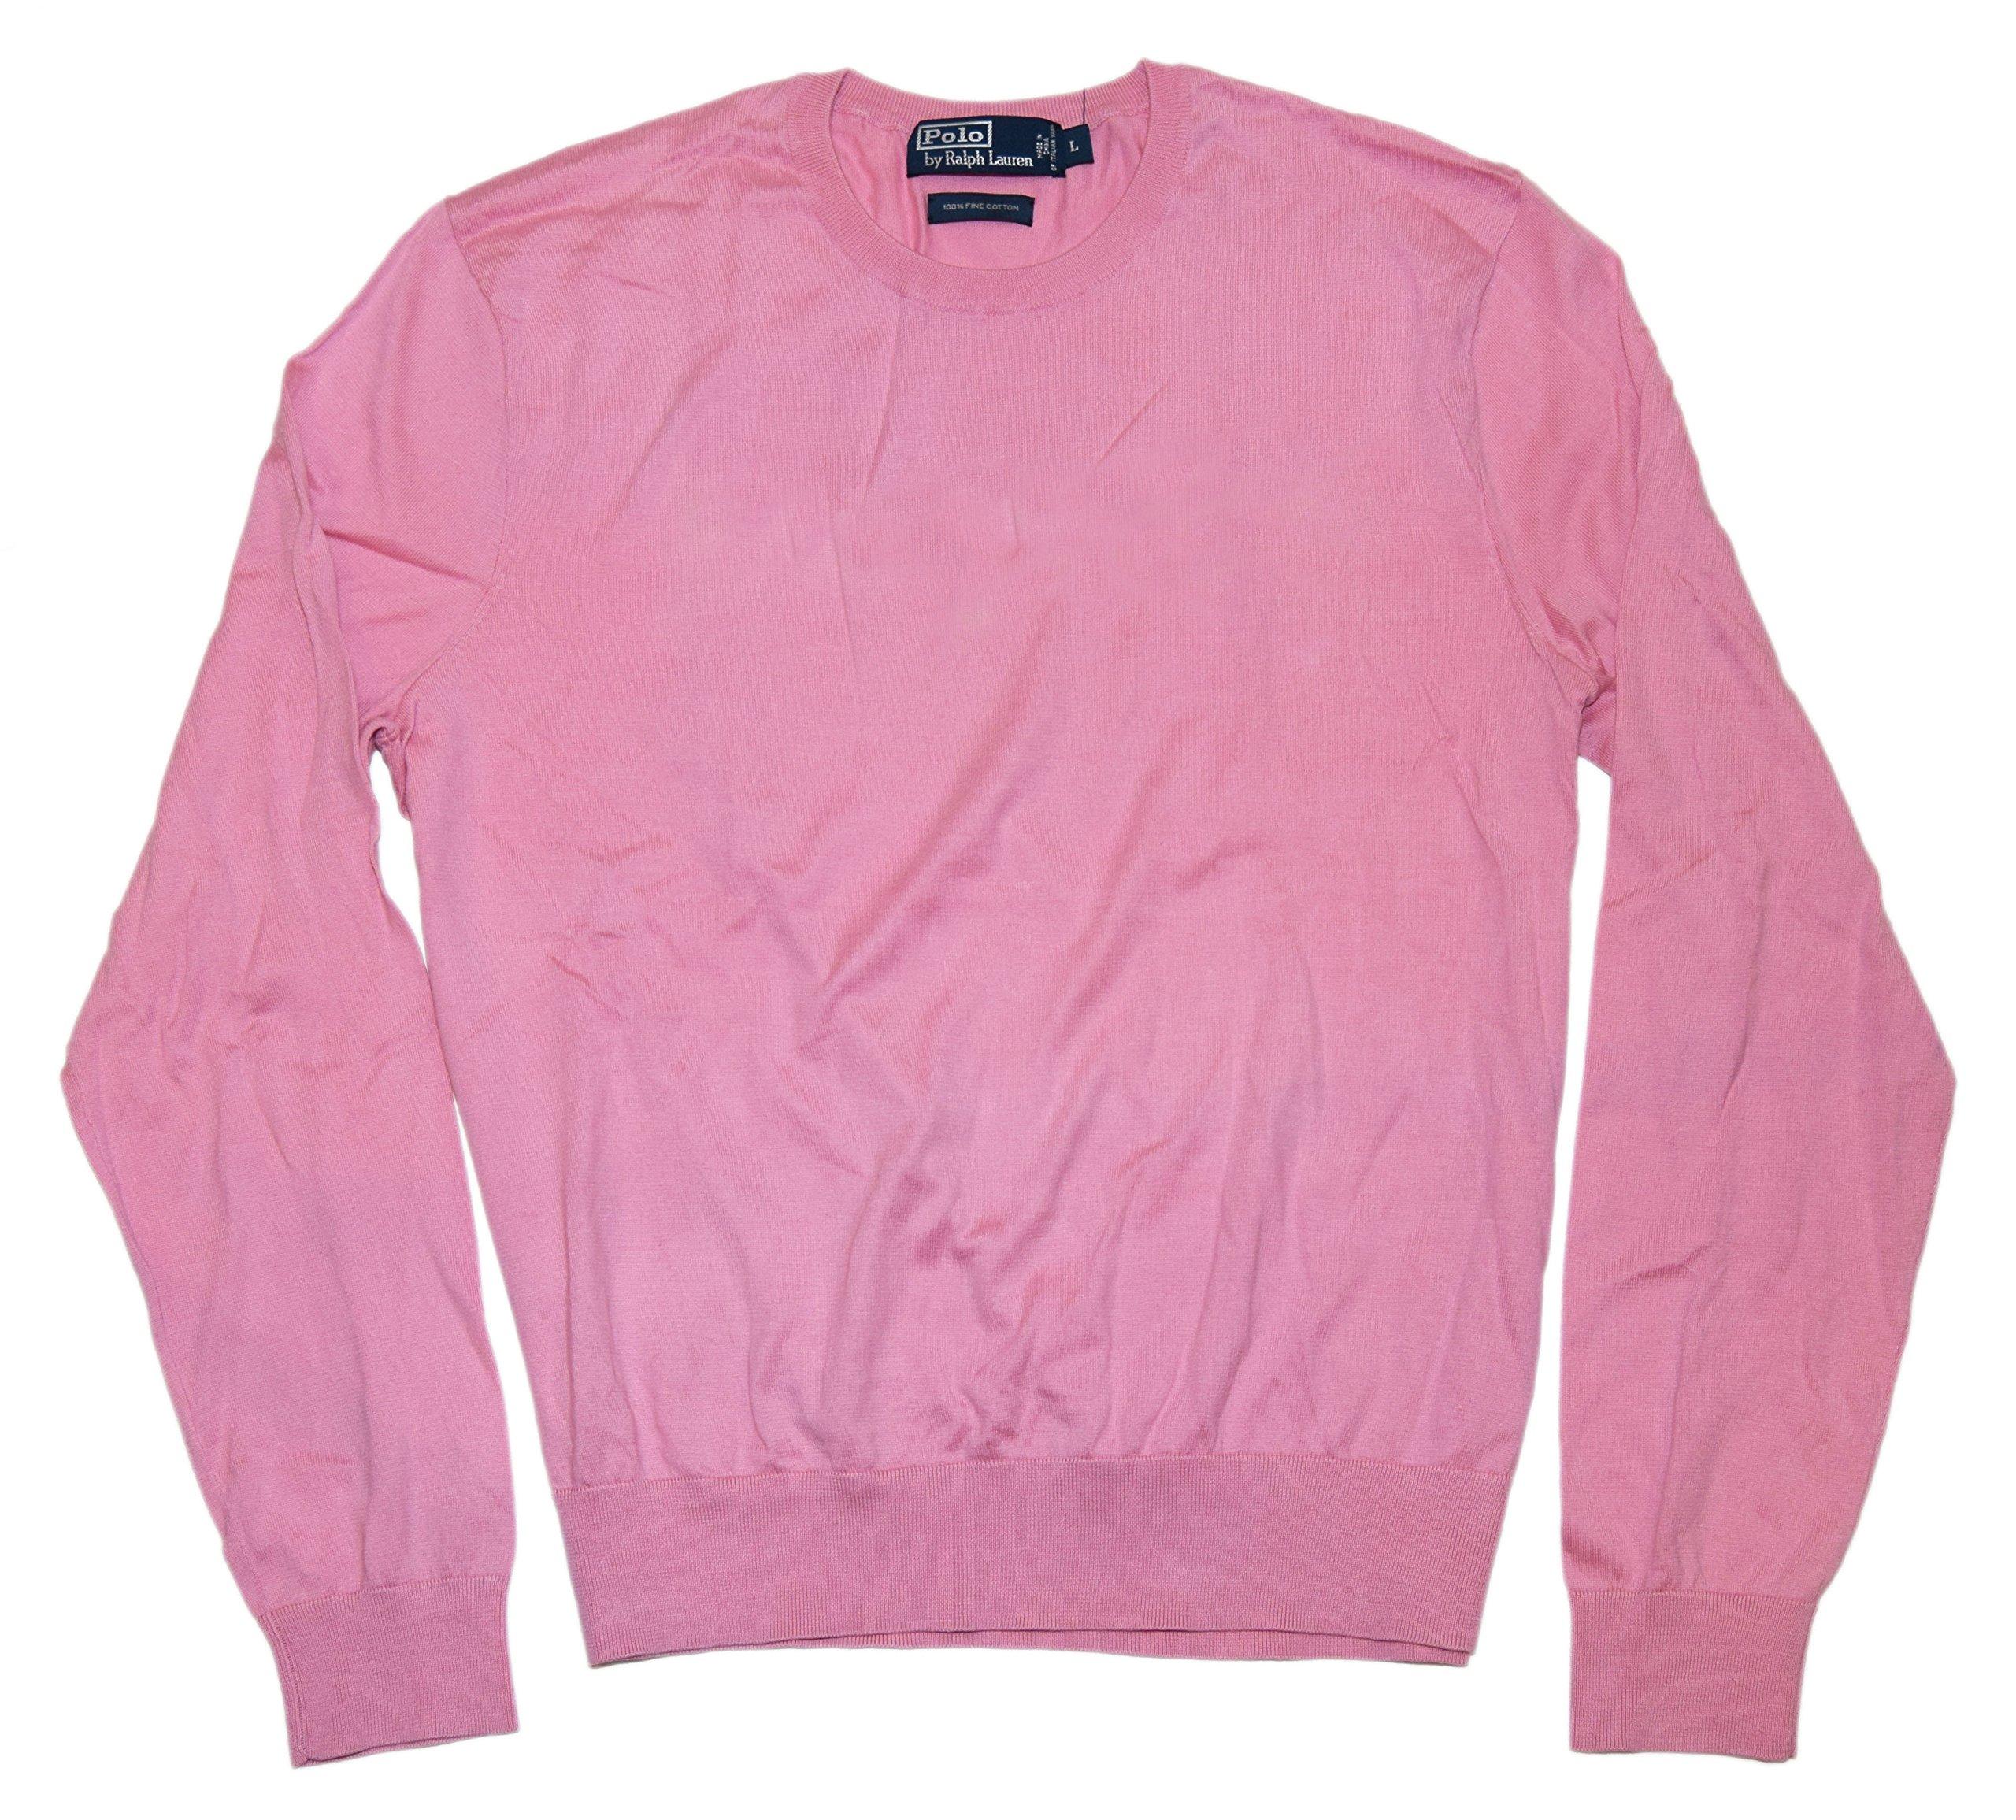 Polo Ralph Lauren Mens Italy Fine Luxury Cotton Crew Neck Sweater Pink Large